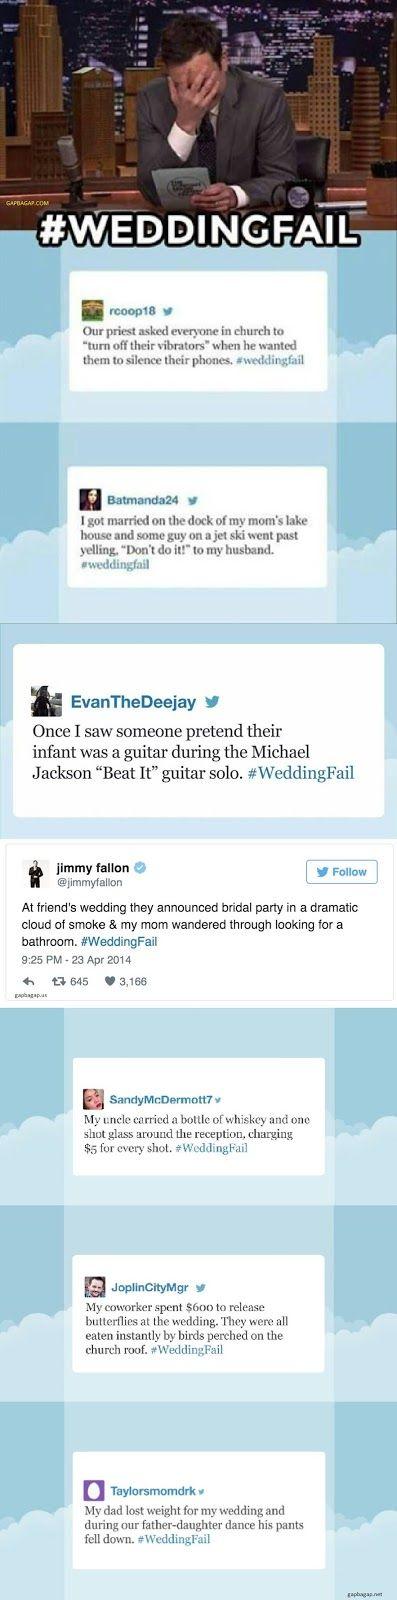 Funny Tweets About #WeddingFail By Jimmy Fallon